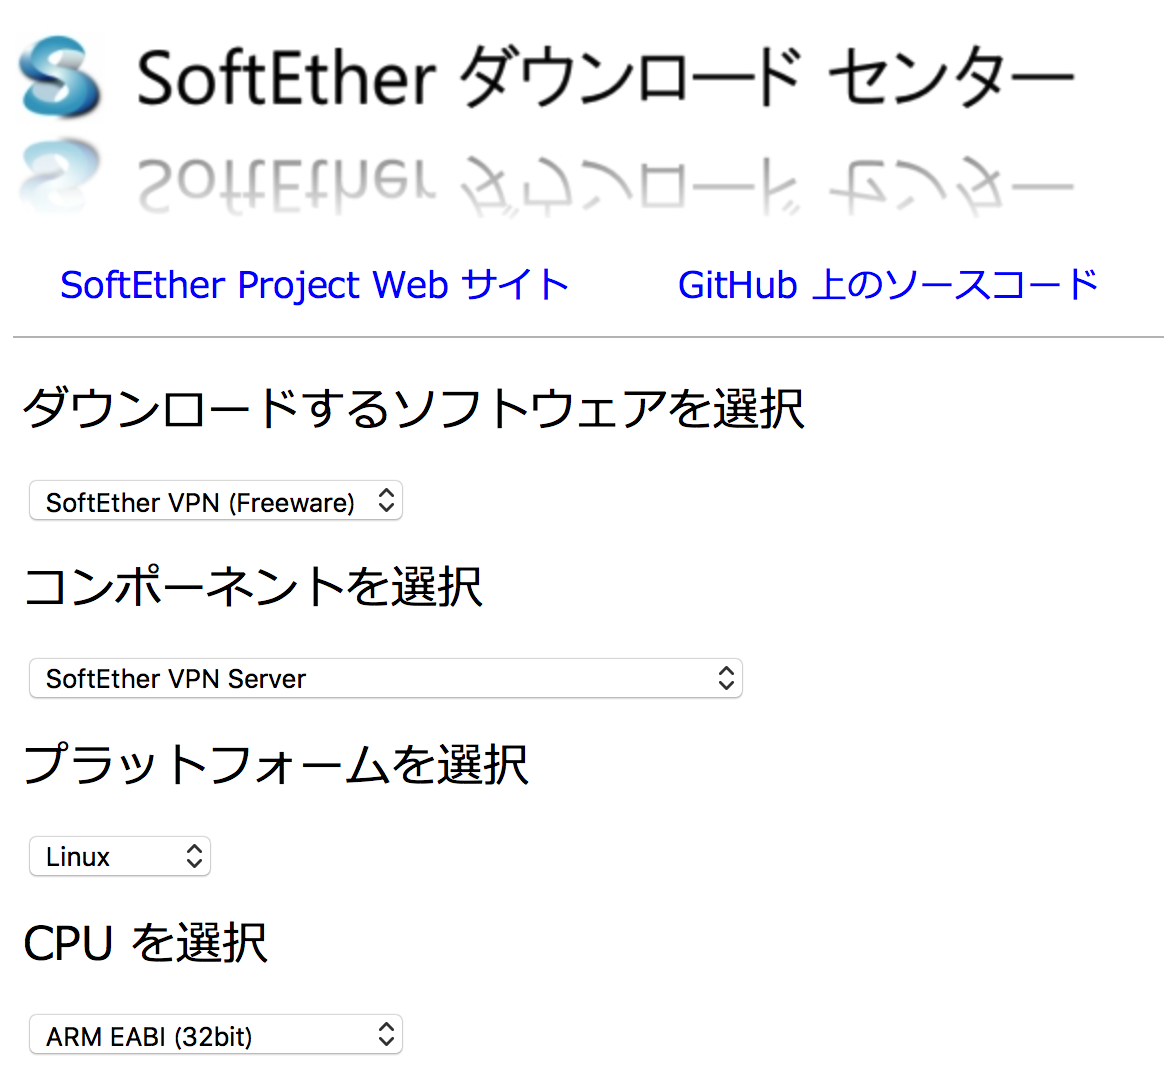 Raspberry PI VPN構築の日まで(1日目、2日目) - Qiita